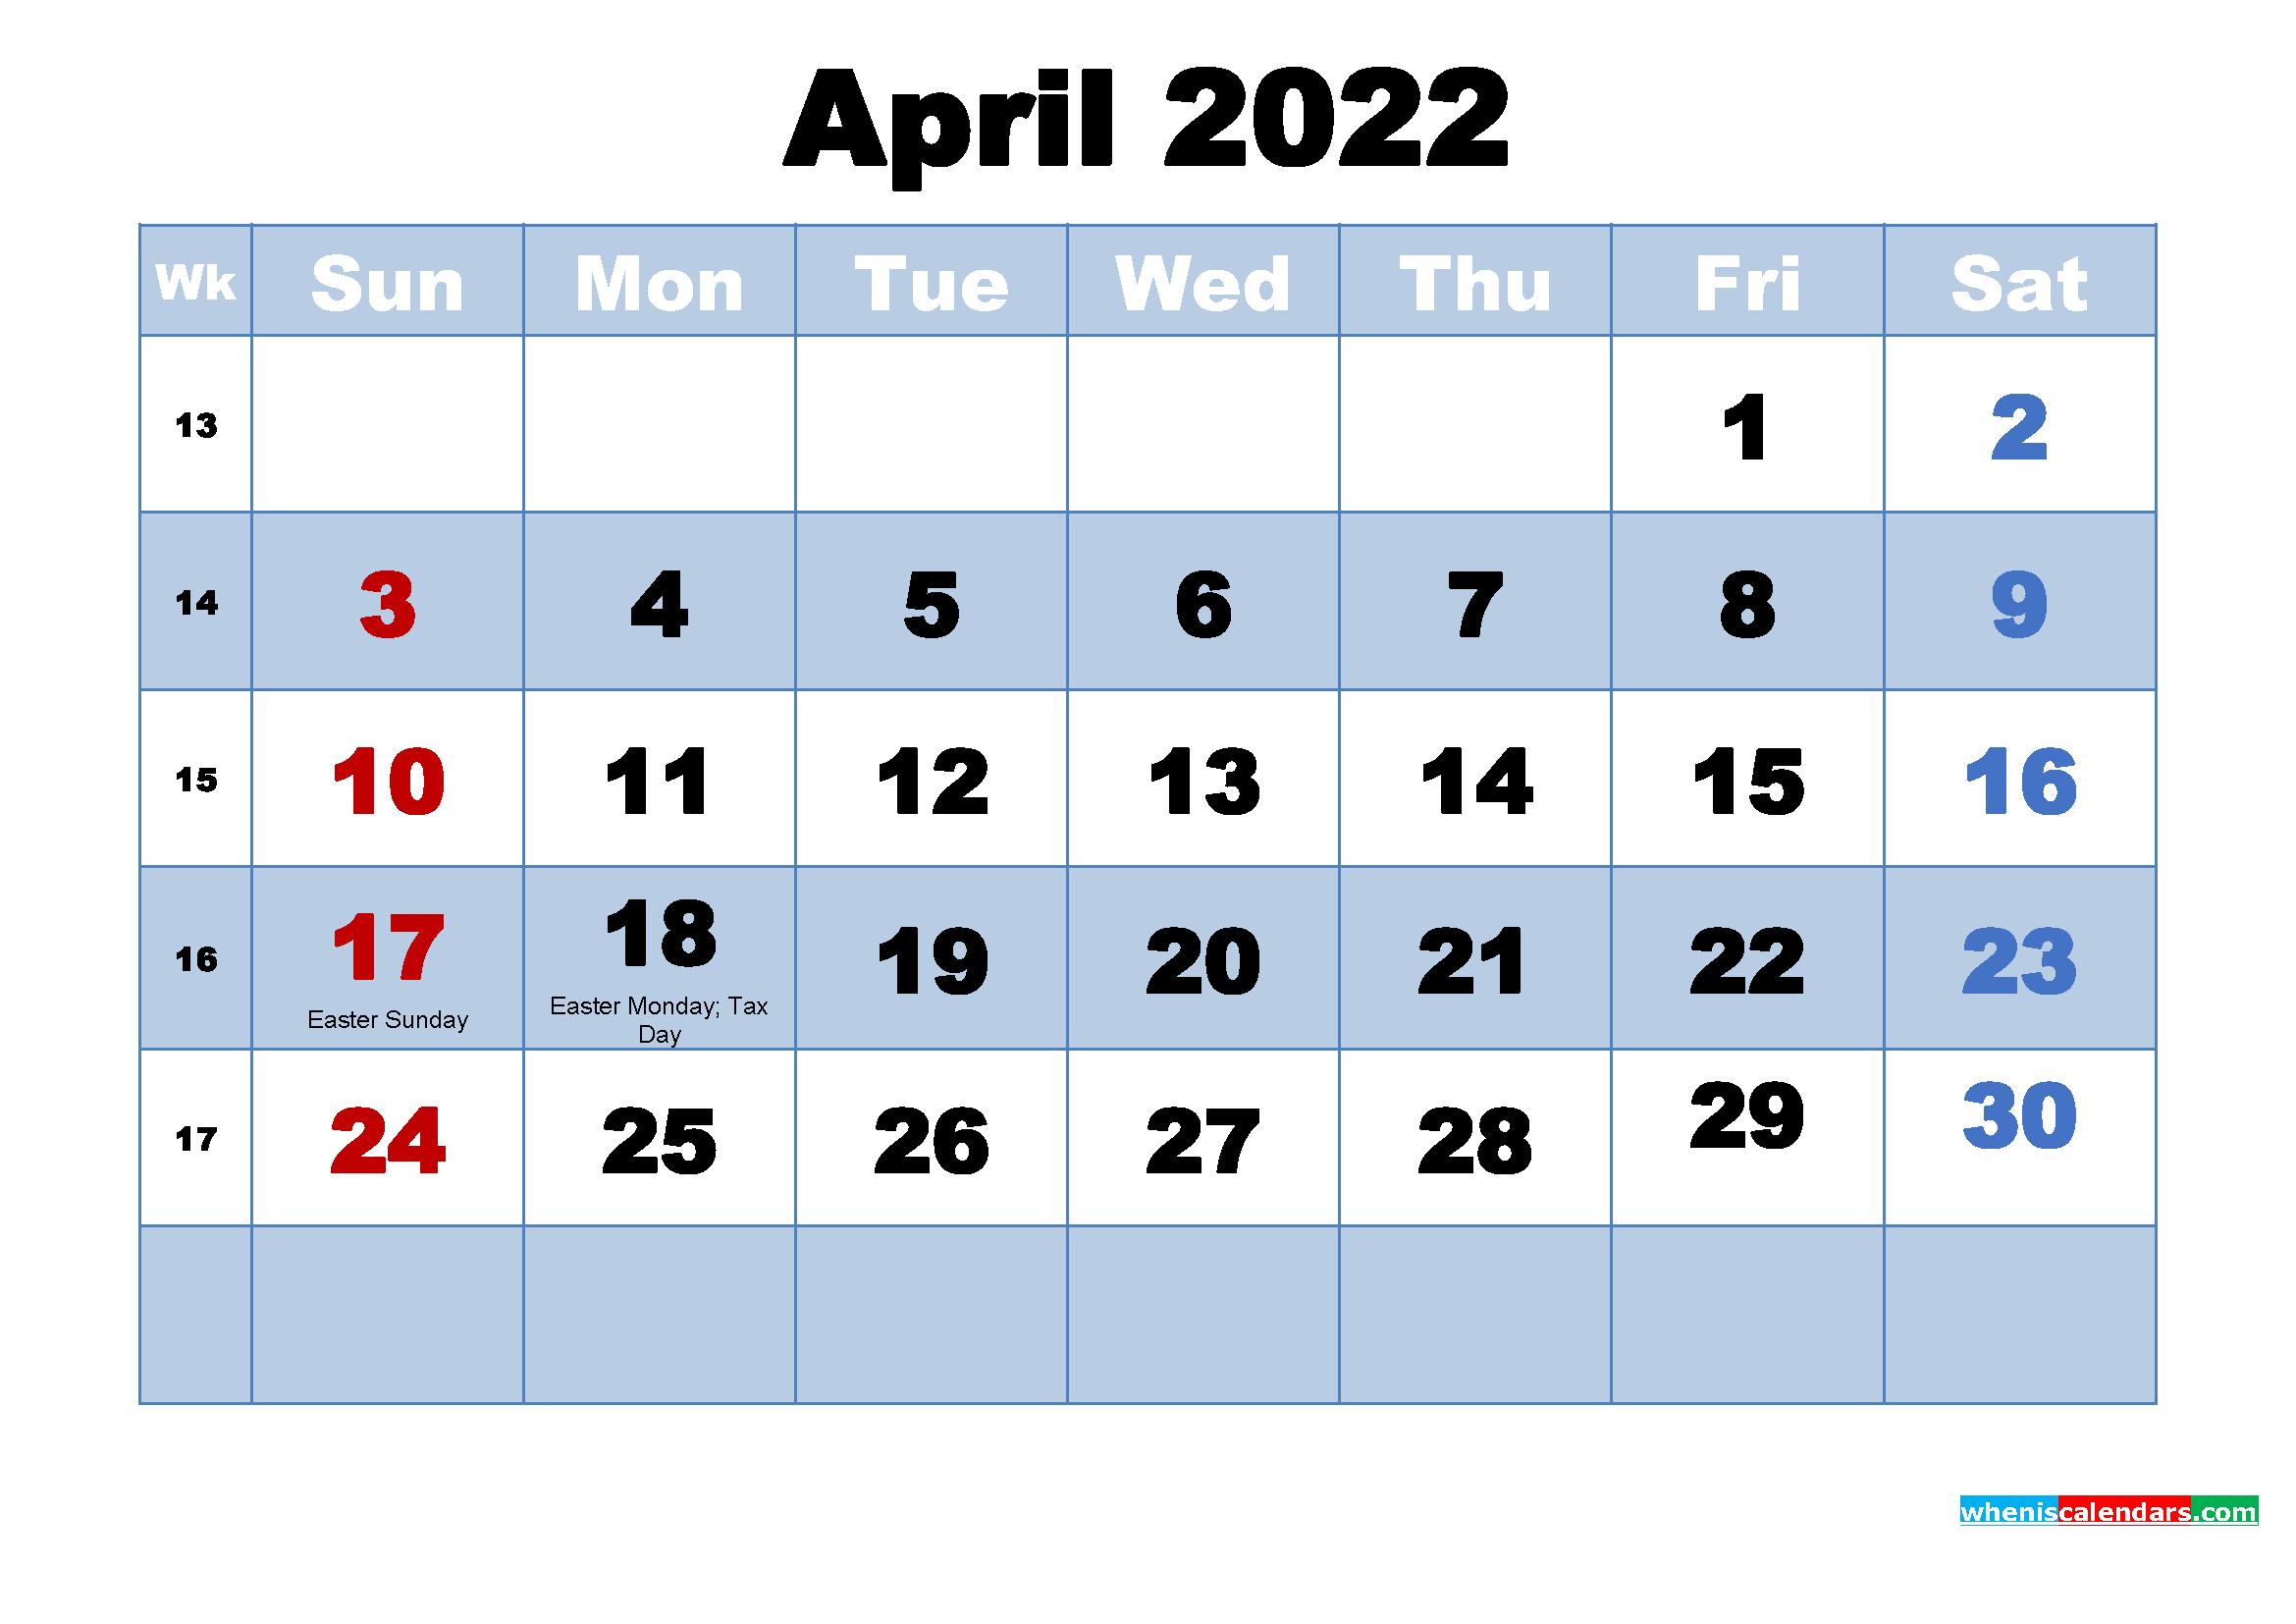 Free Printable 2022 Calendar April As Word, Pdf intended for April 2022 Calendar Printable Photo